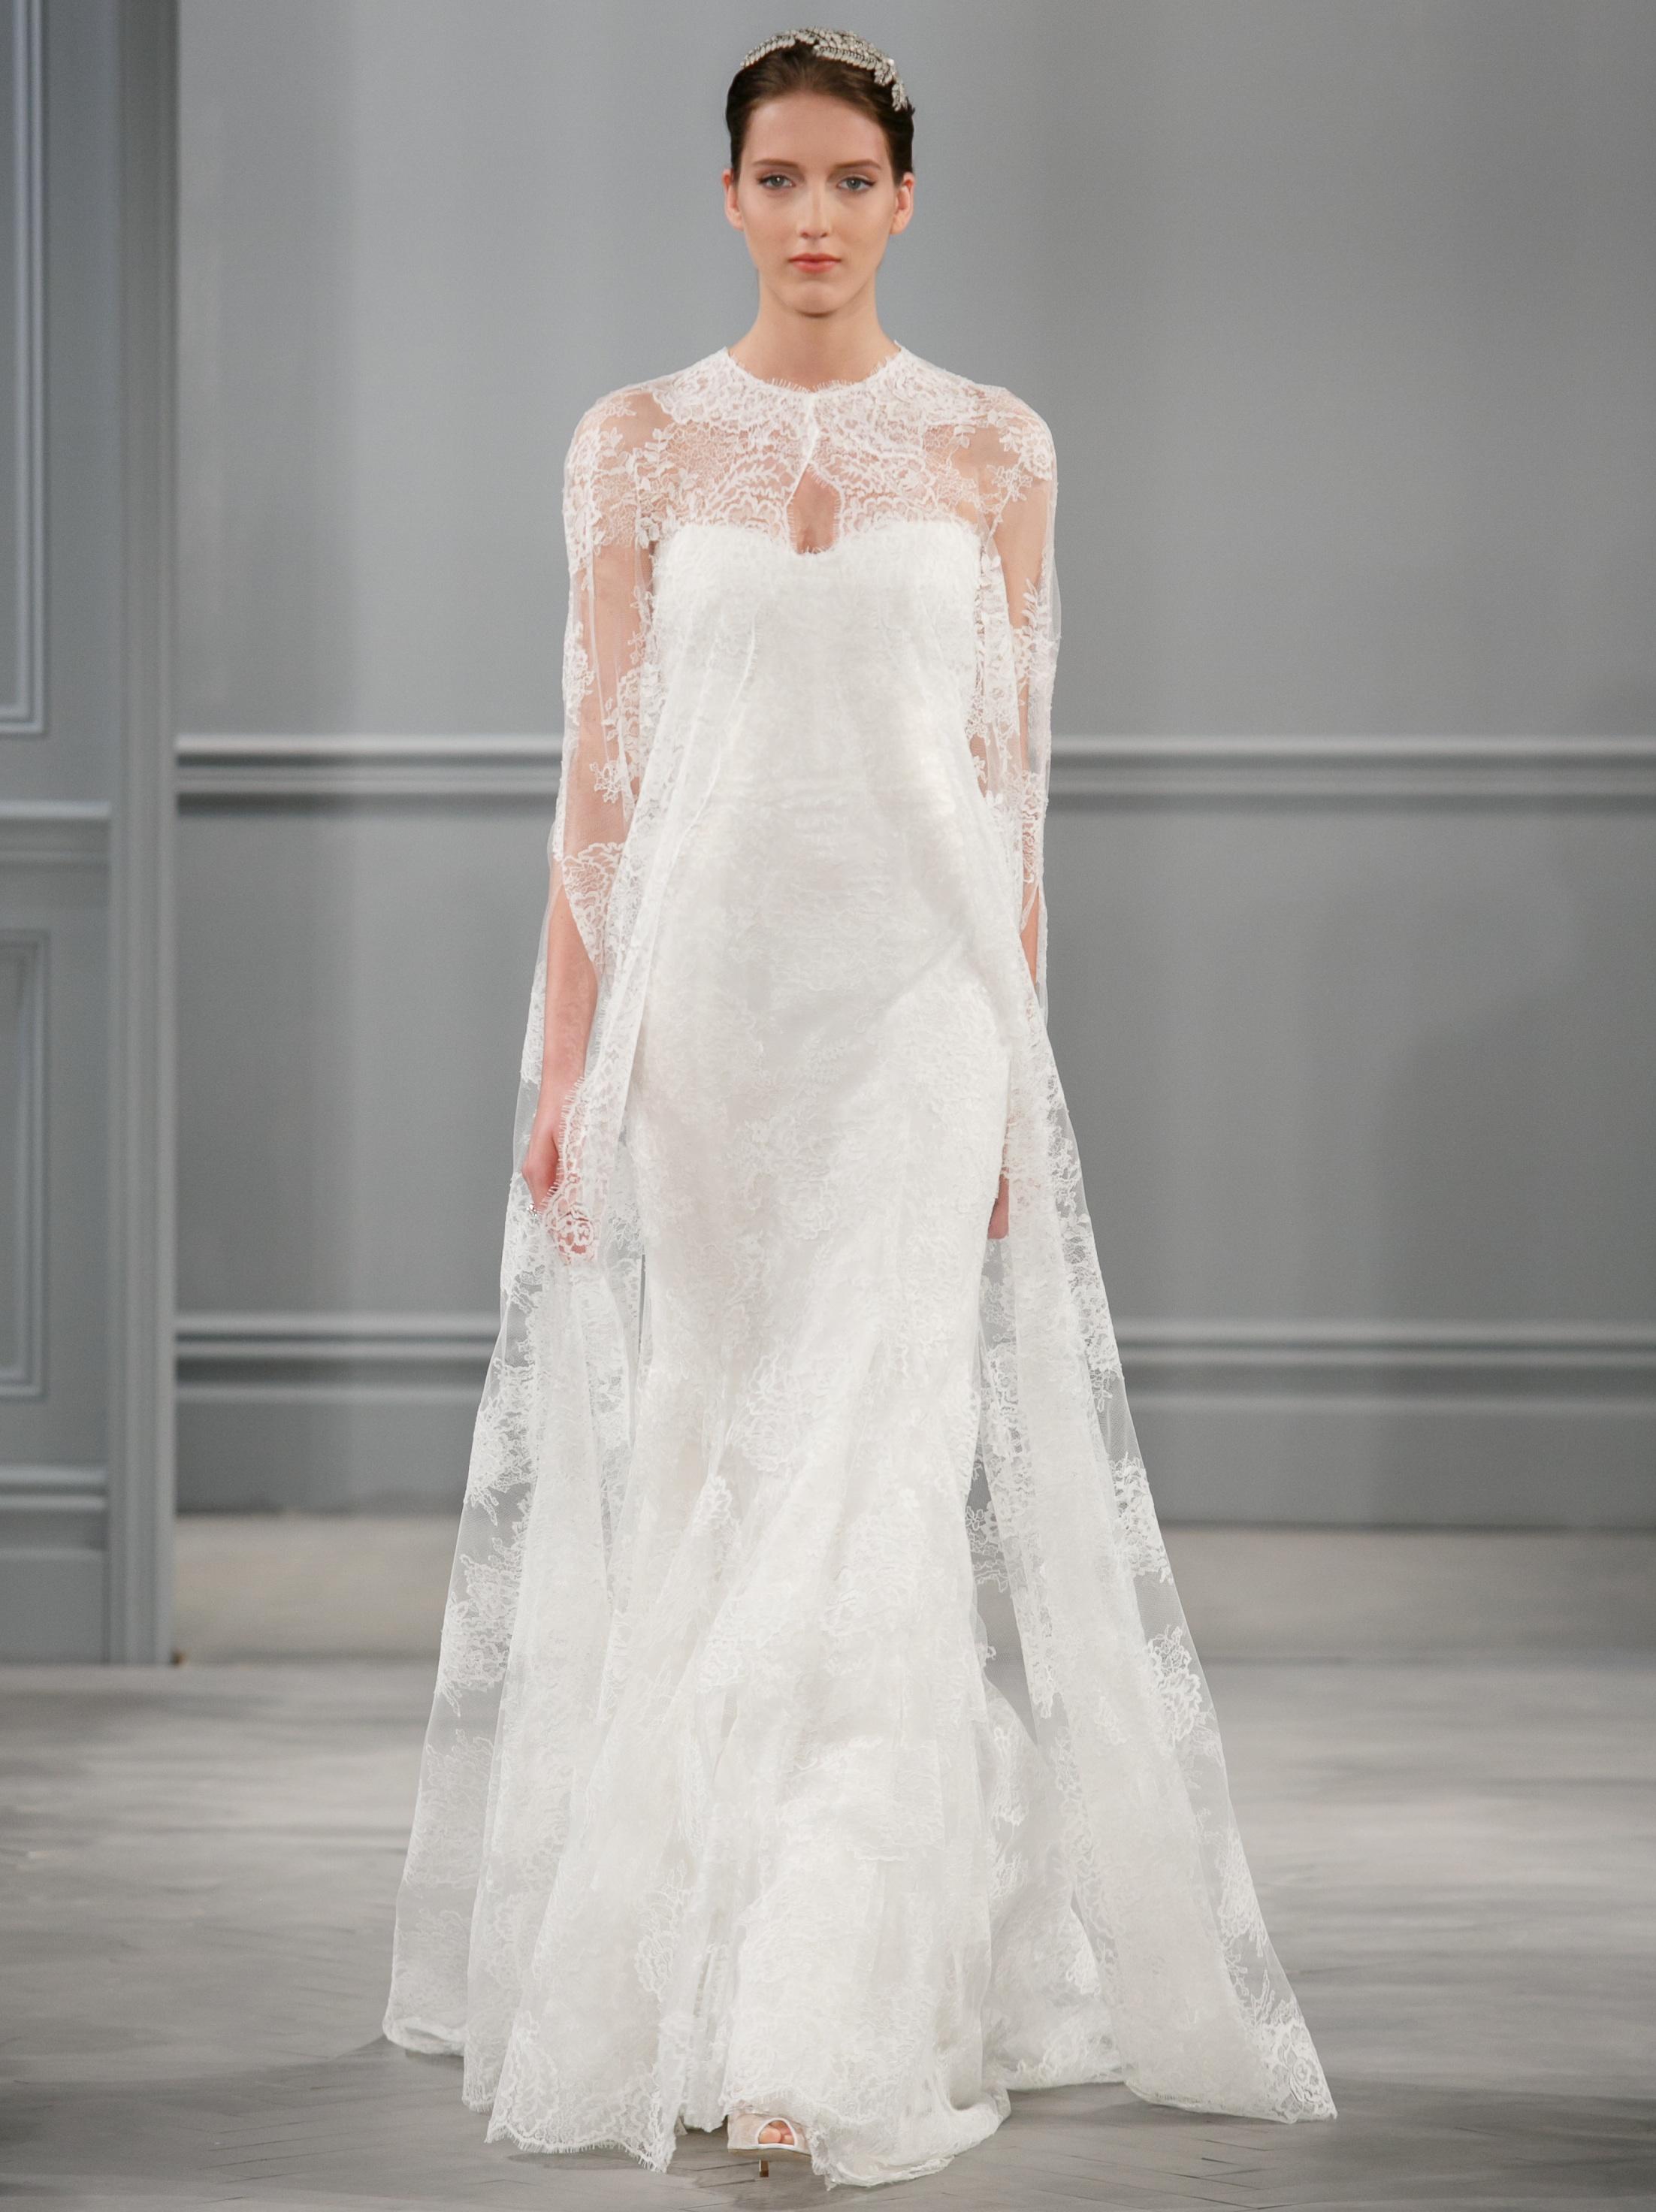 Spring 2014 wedding dress monique lhuillier bridal for Monique lhuillier brooke wedding dress